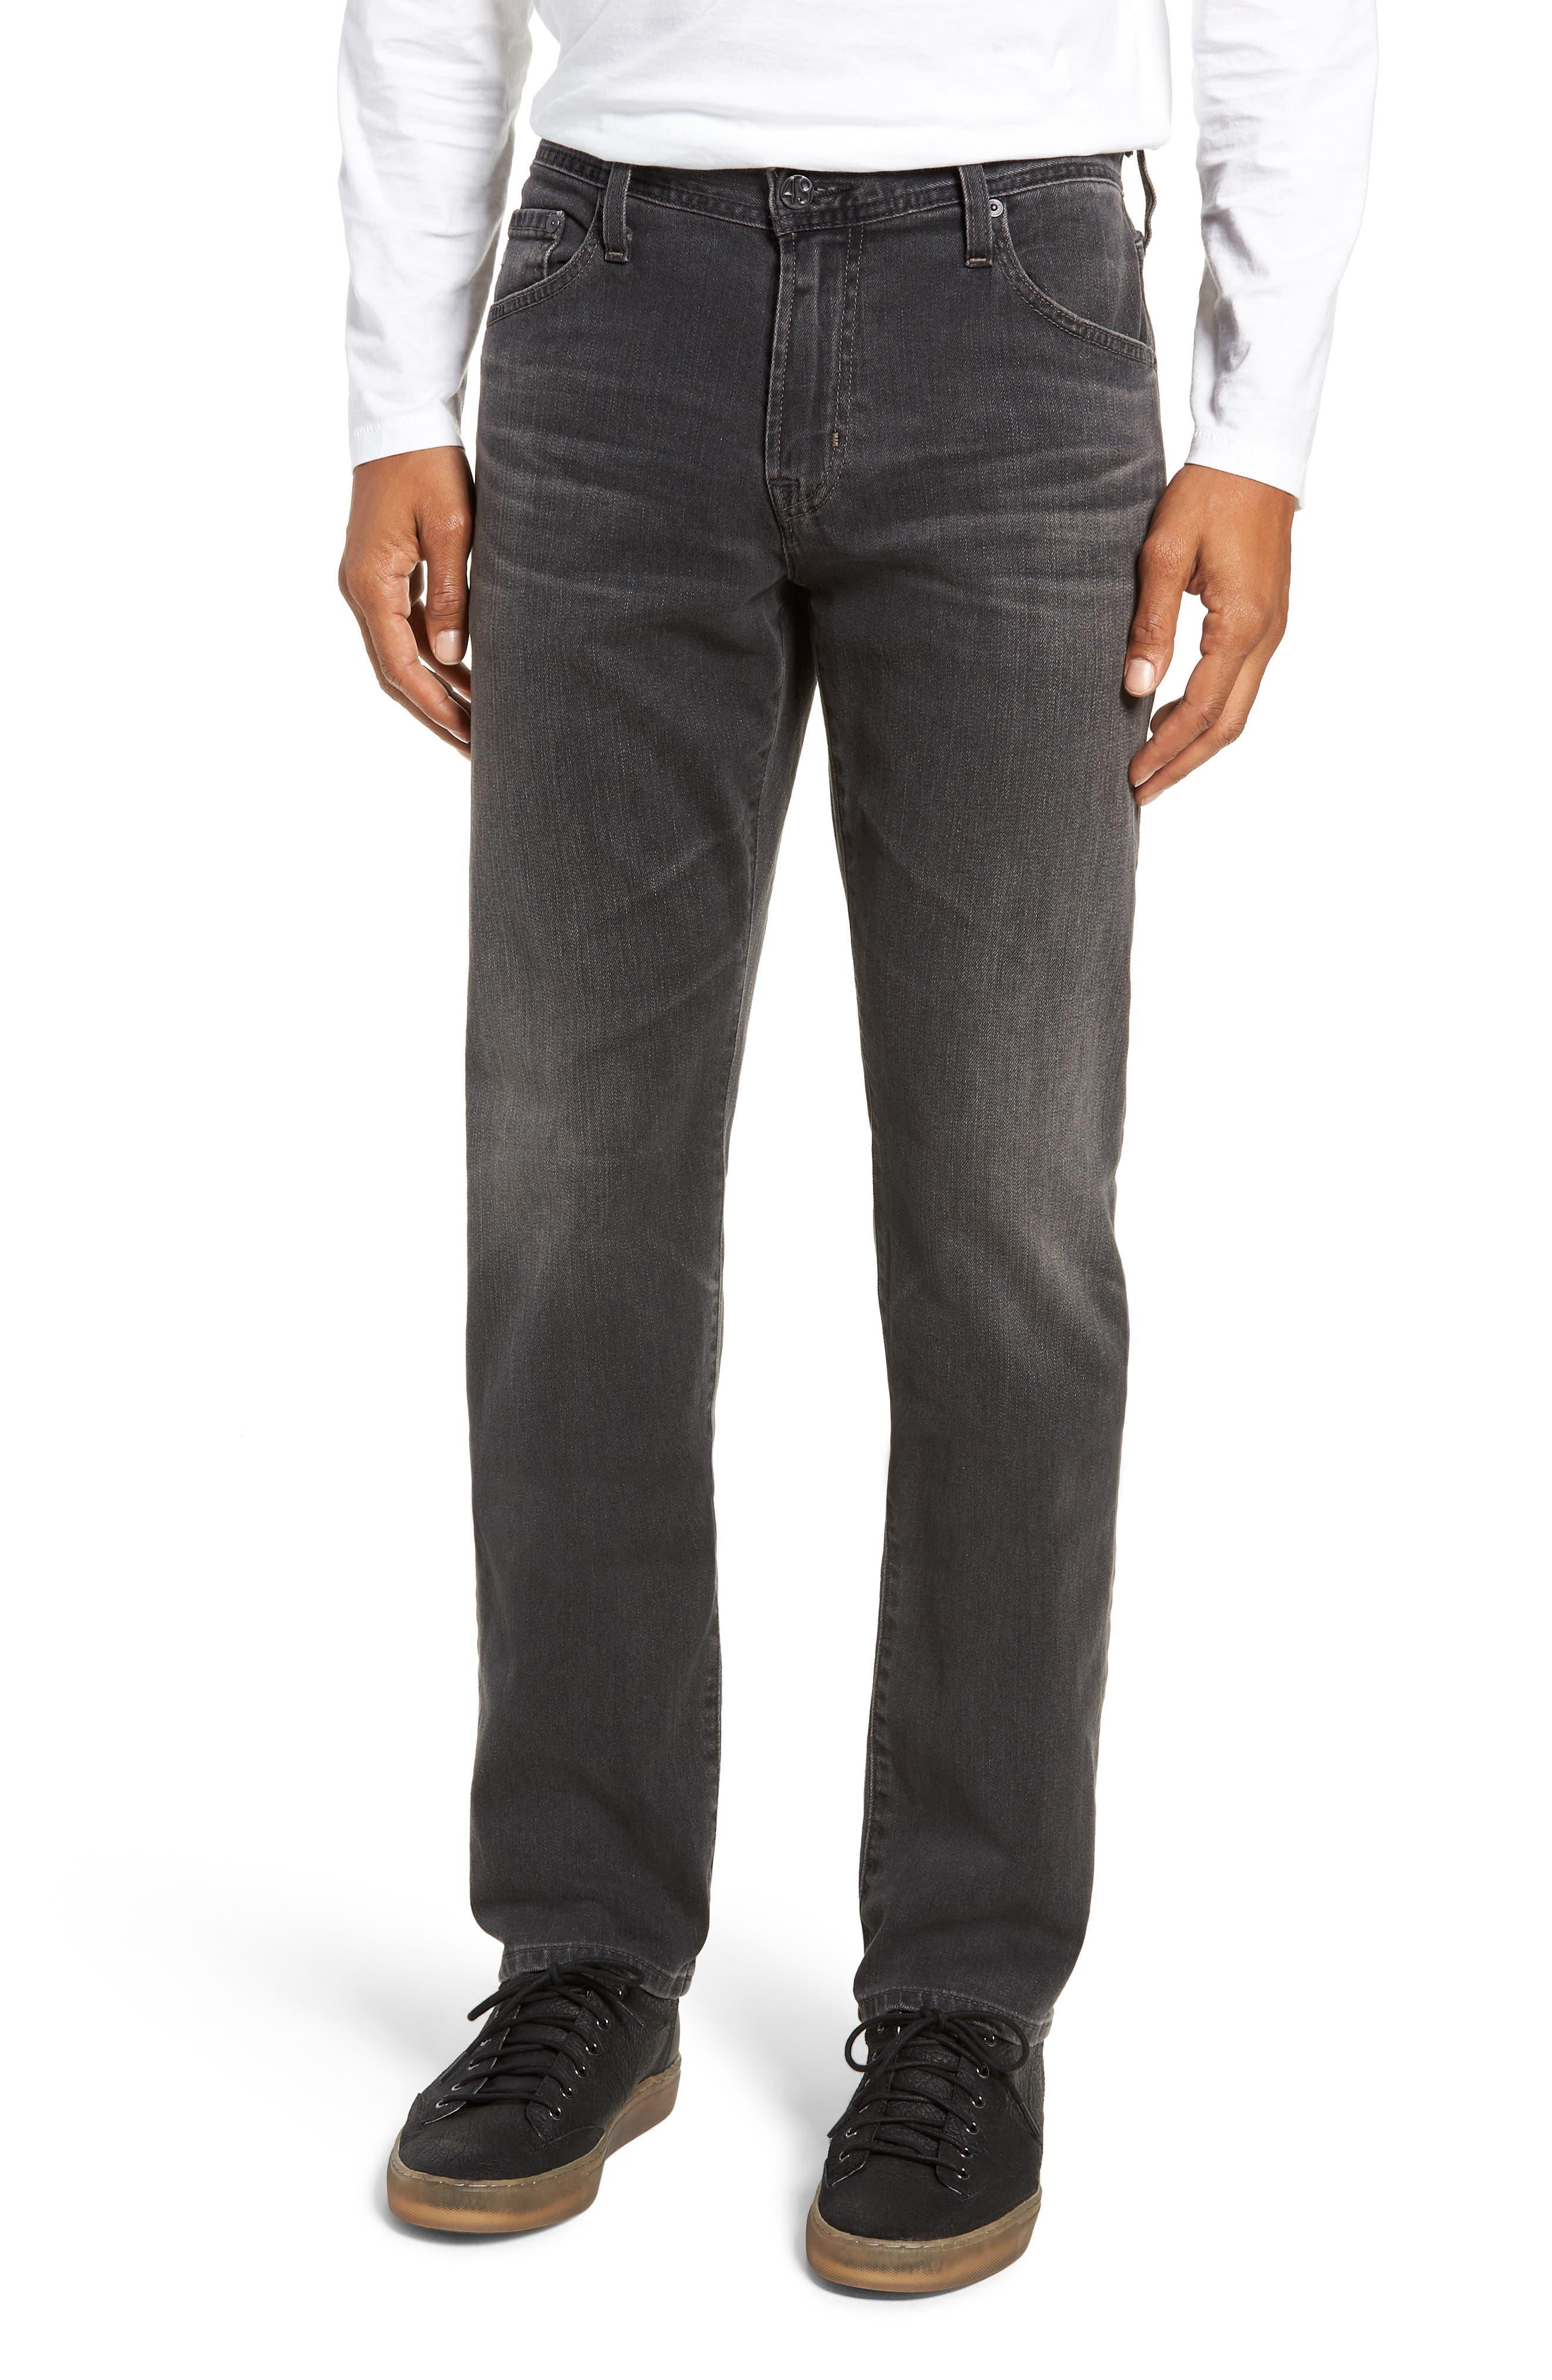 Graduate Slim Straight Leg Jeans,                             Main thumbnail 1, color,                             6 YEARS ARCADE